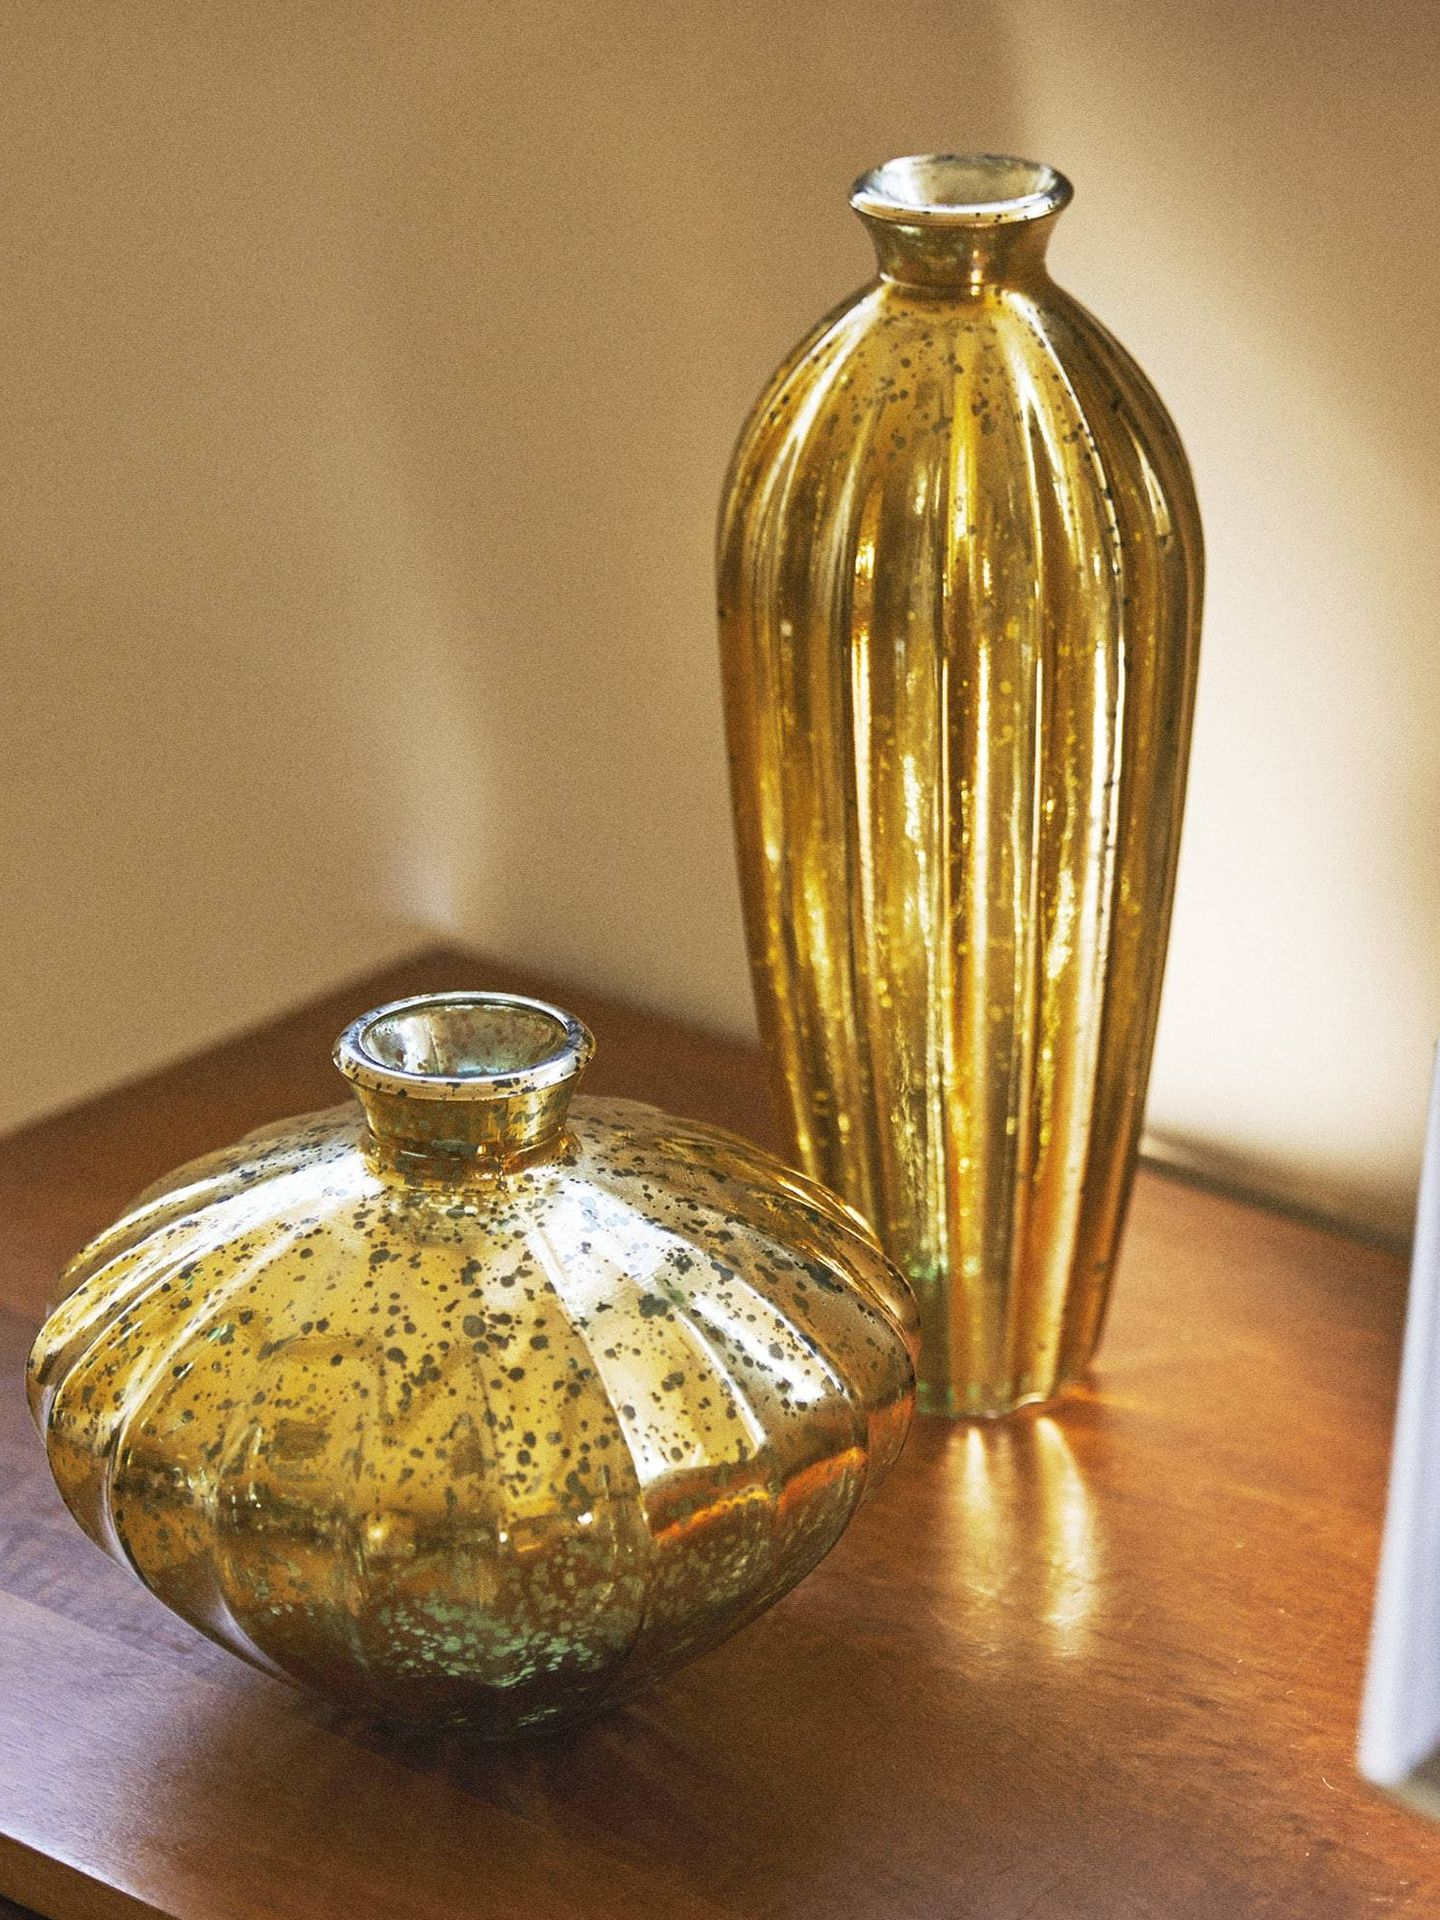 Zara Home te invita a decorar con vidrio mercurizado. (Cortesía)